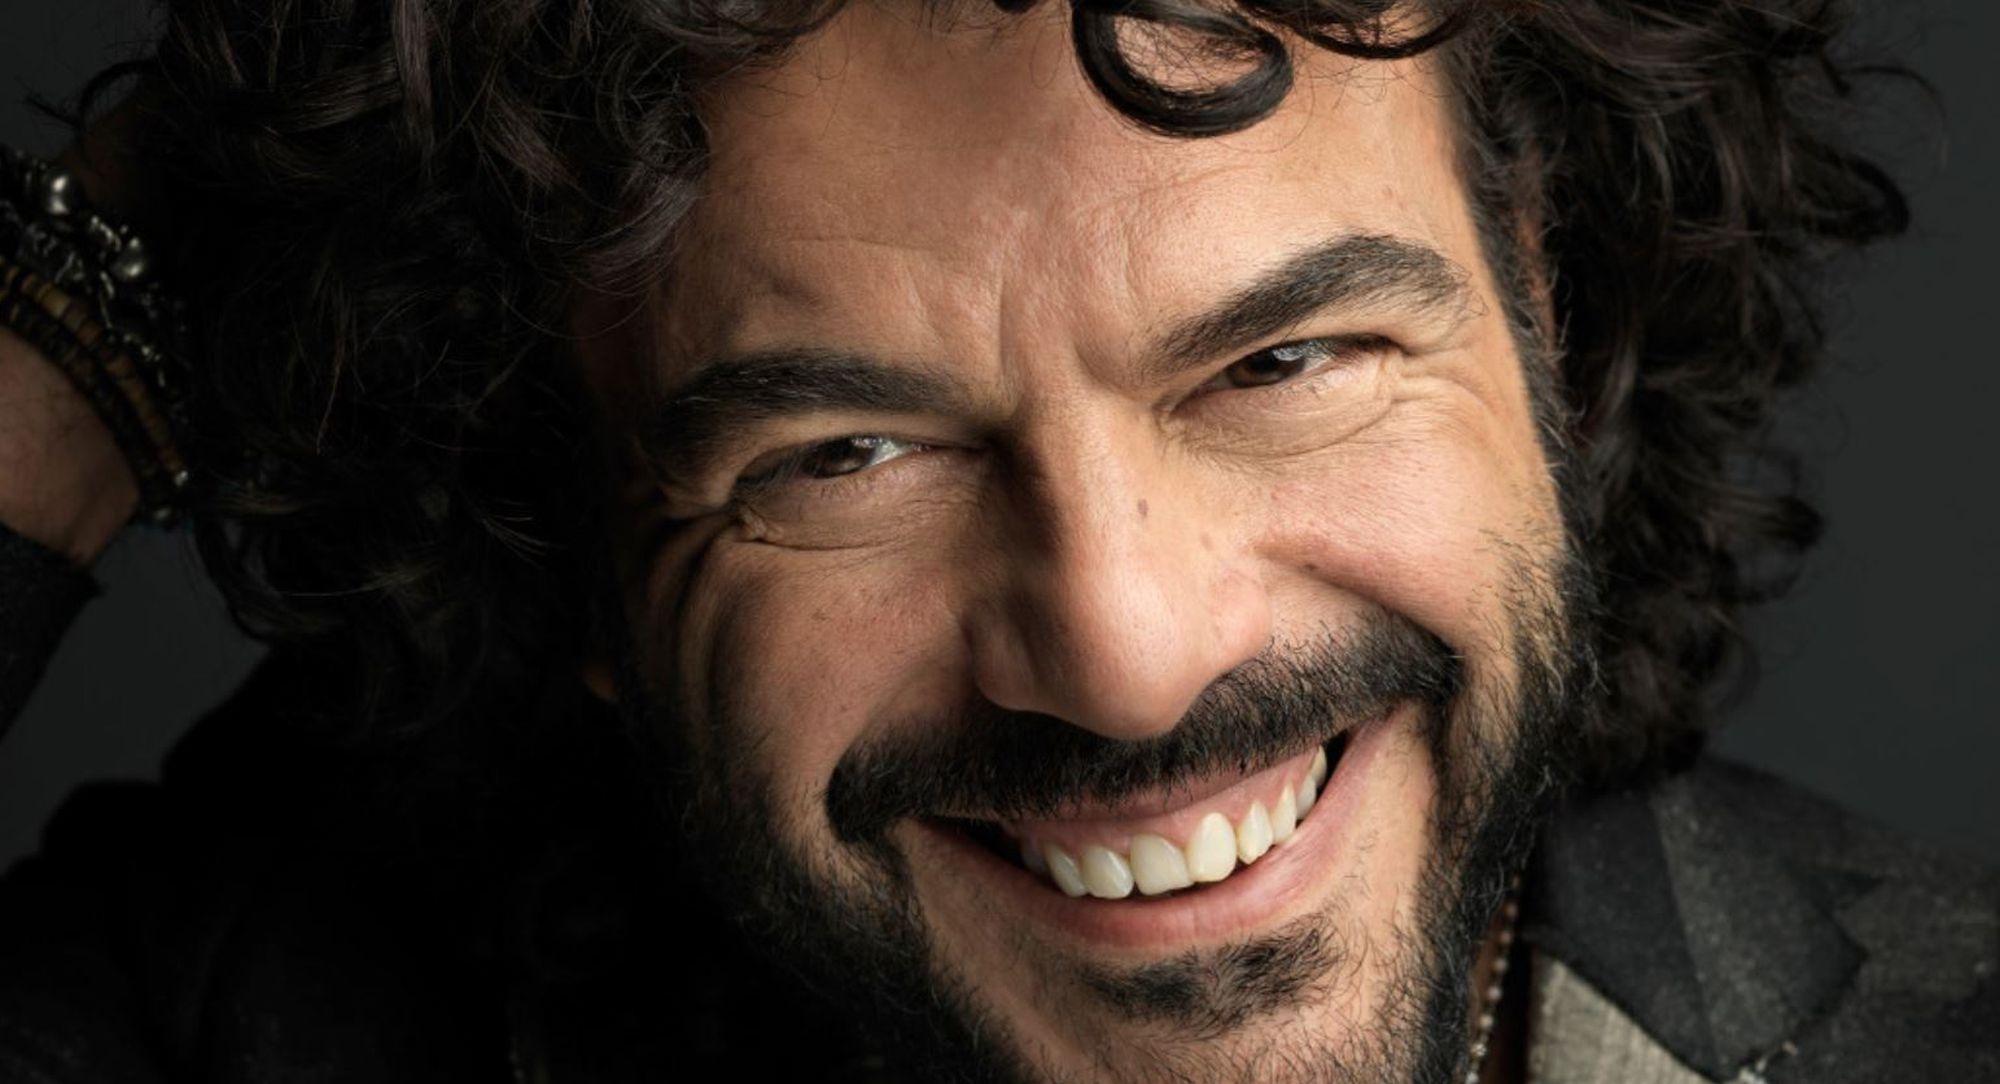 Concerti Francesco Renga estate 2021: date, biglietti e scaletta